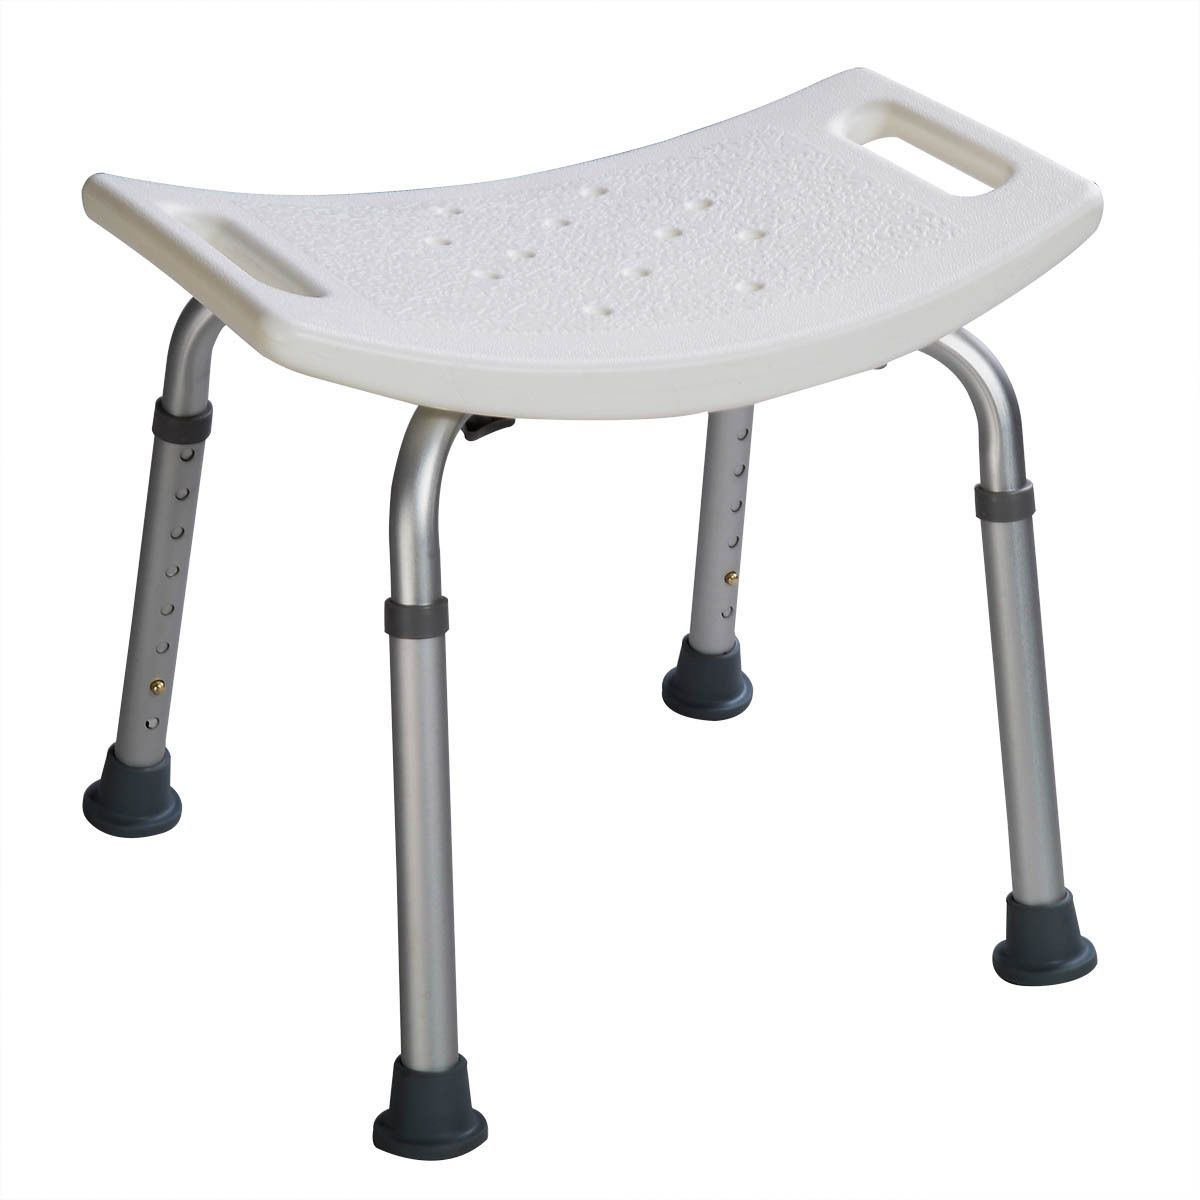 8 Height Adjustable Shower Chair Medical Bath Bench Bathtub Stool Seat  White New